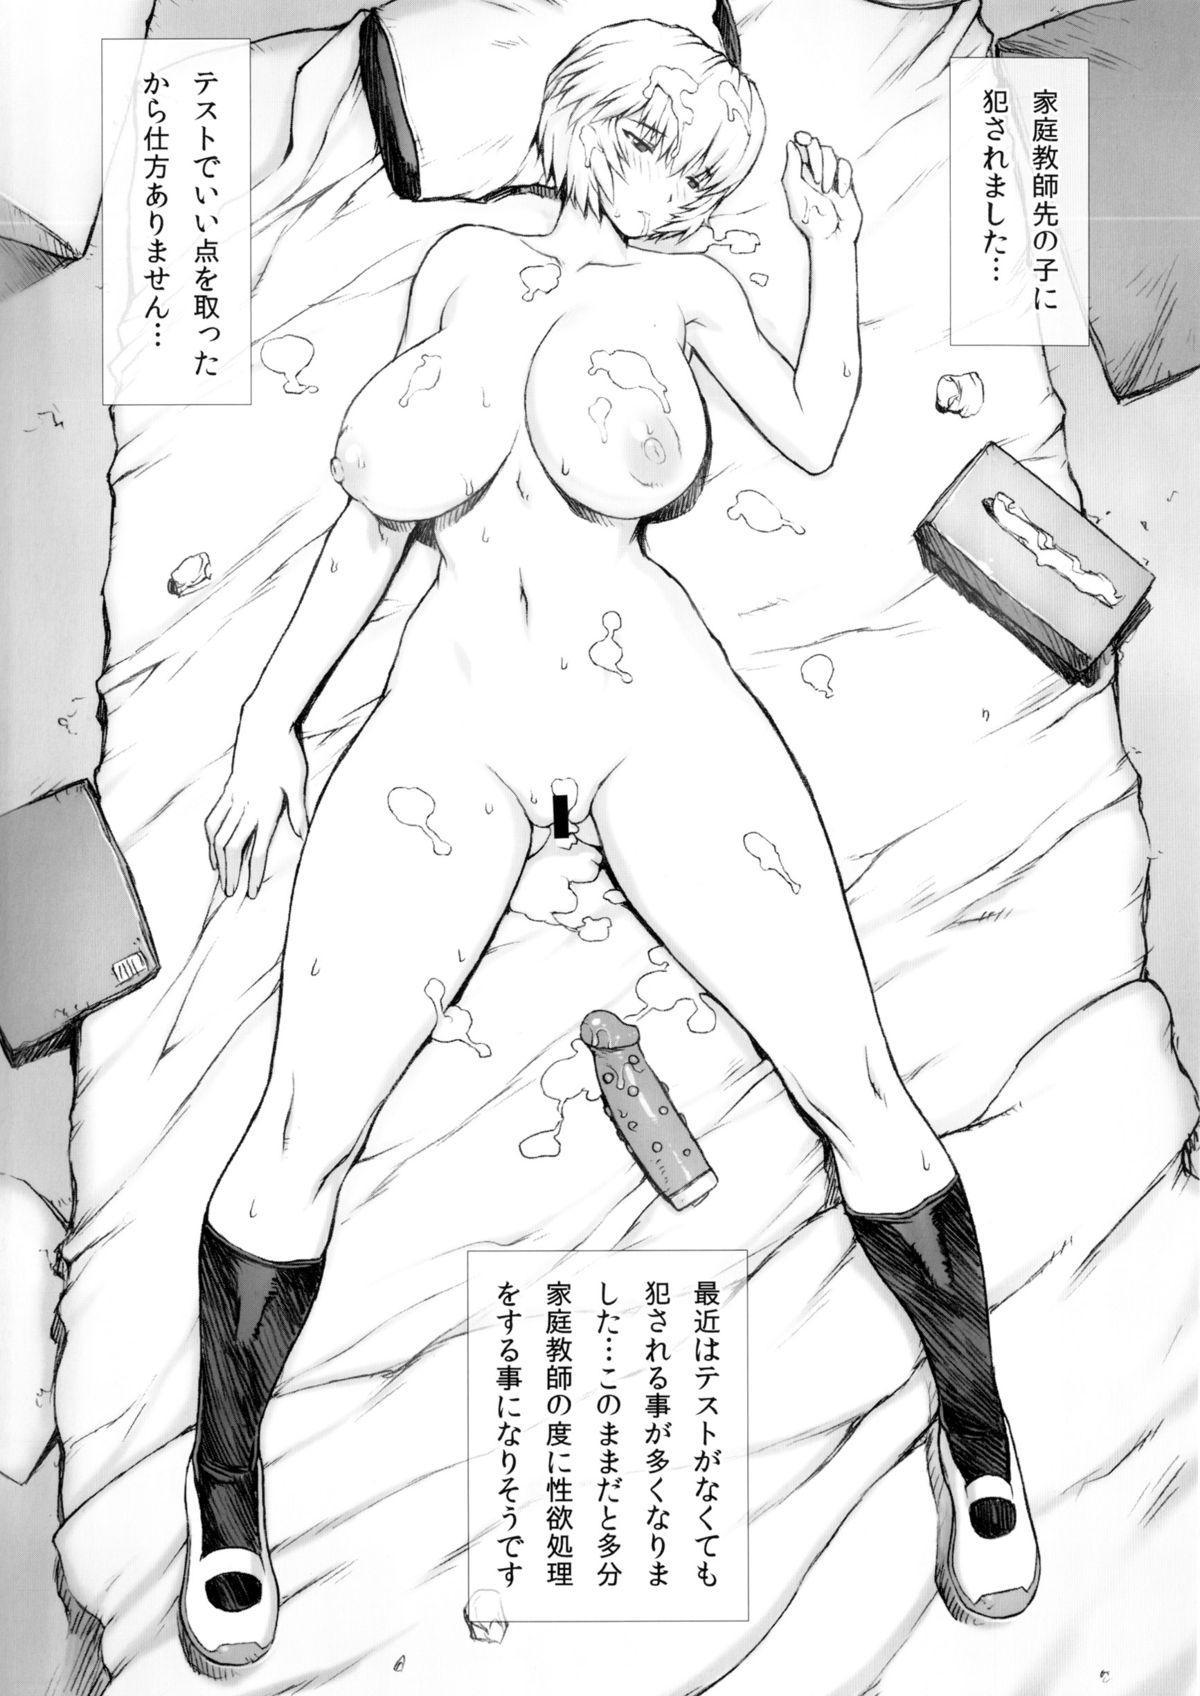 Ayanami Dai 4 Kai + Omake Bon + Postcard 48